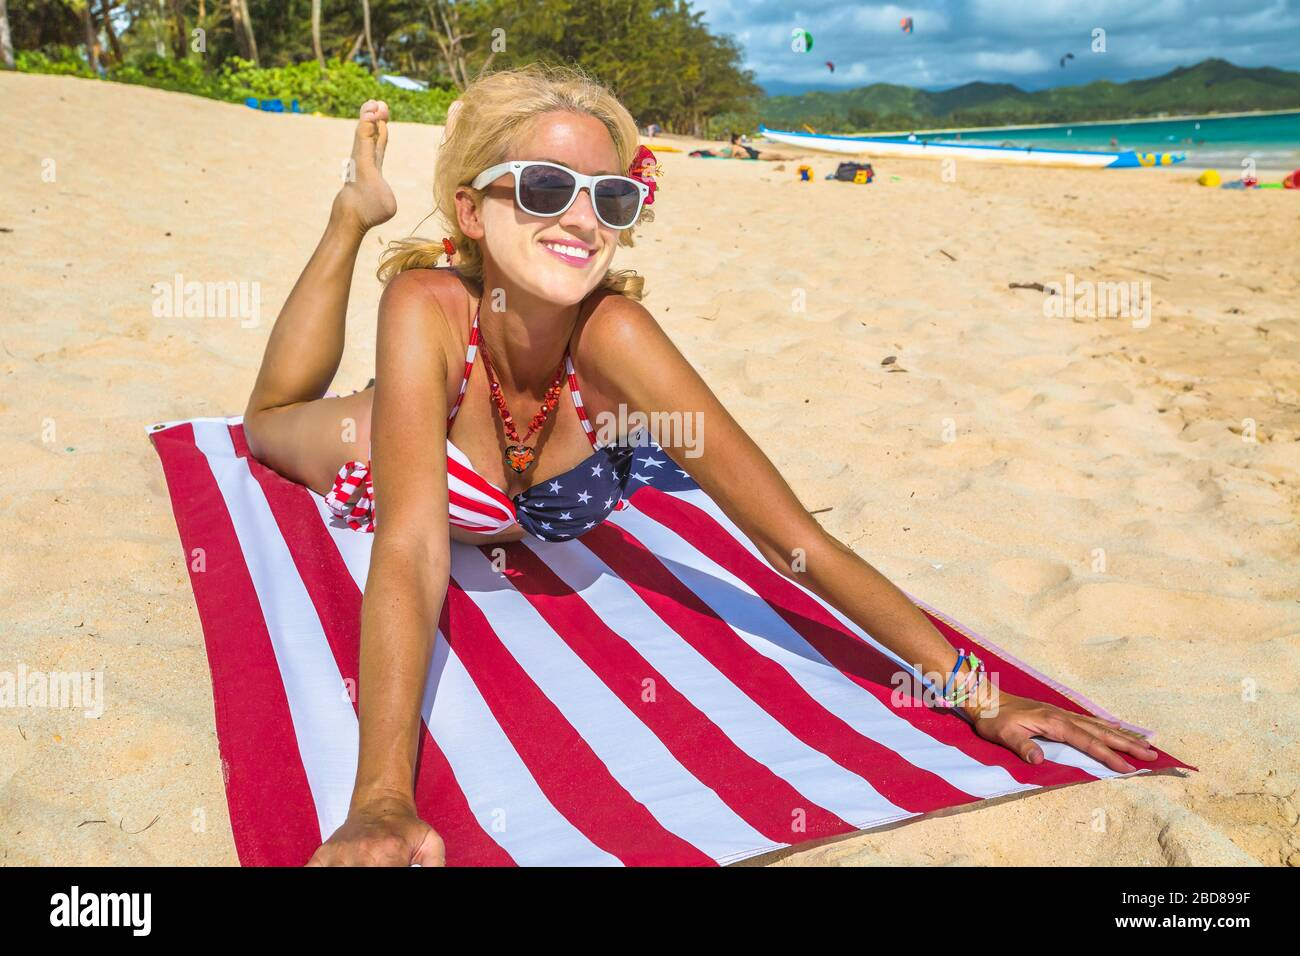 Picture Of Lanikai On Oahu 4 Lanikai Towel Package Large Hawaii Beach Towel!